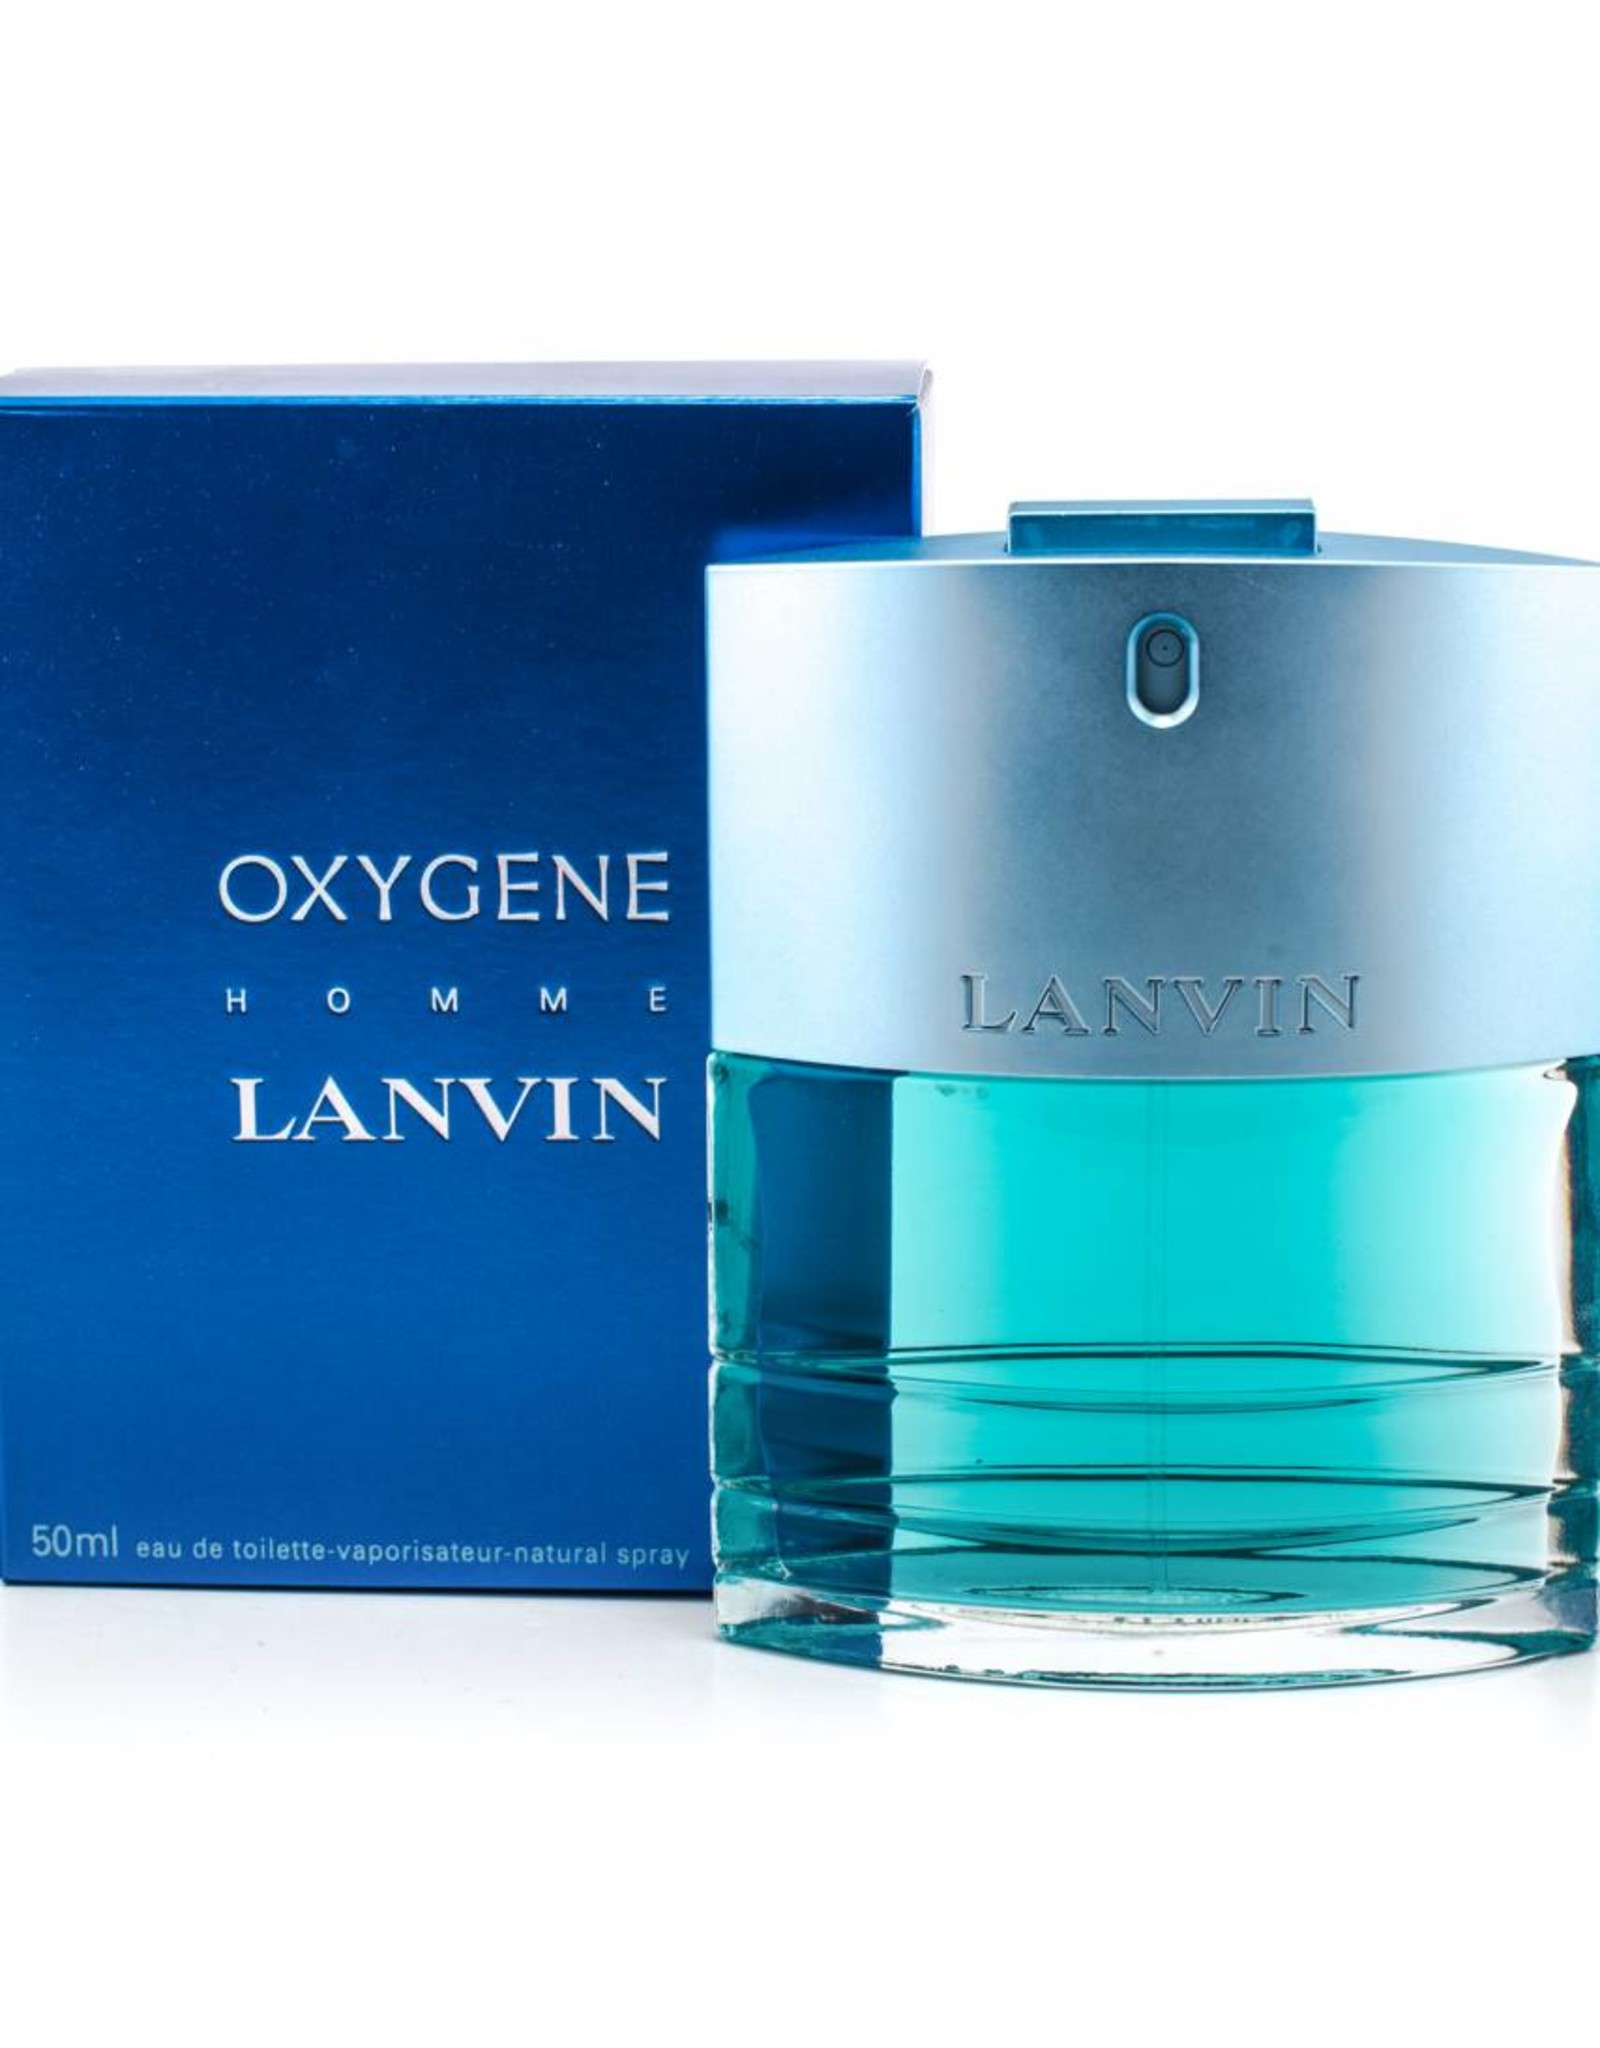 LANVIN LANVIN OXYGENE (MEN)